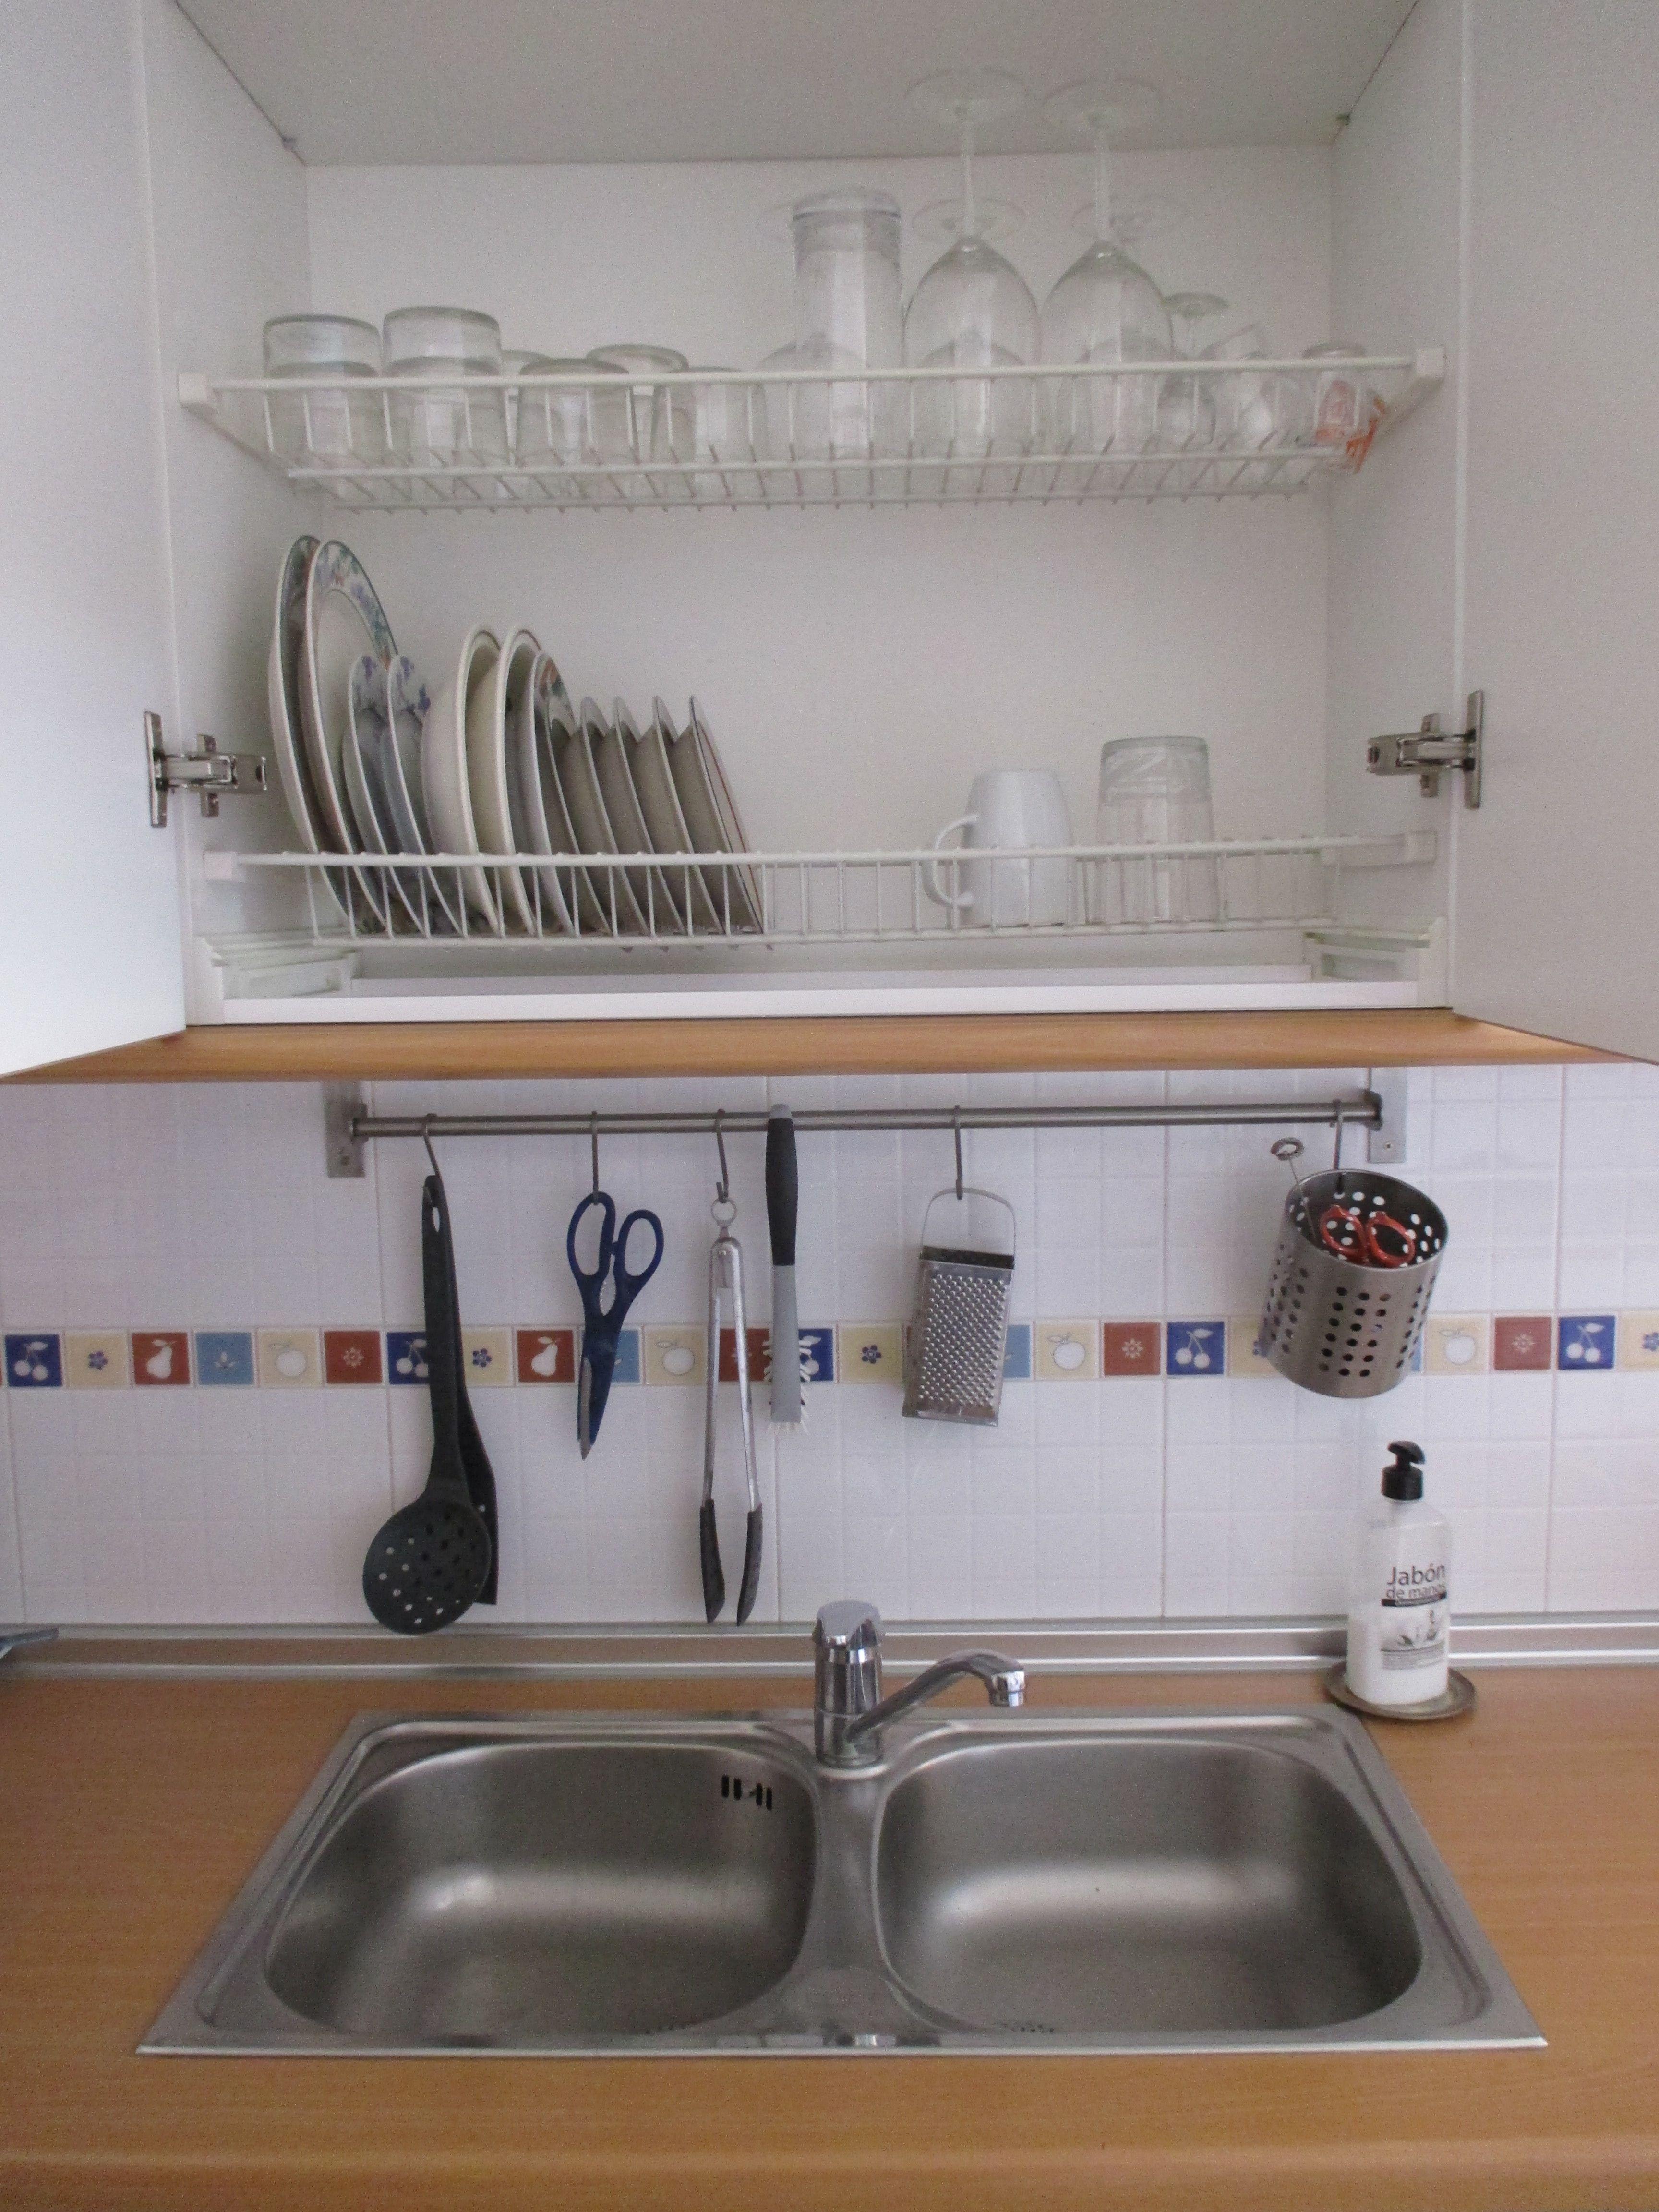 My Spanish Favorites Dish Drain Cupboard Kitchen Sink Design Kitchen Sink Storage Kitchen Design